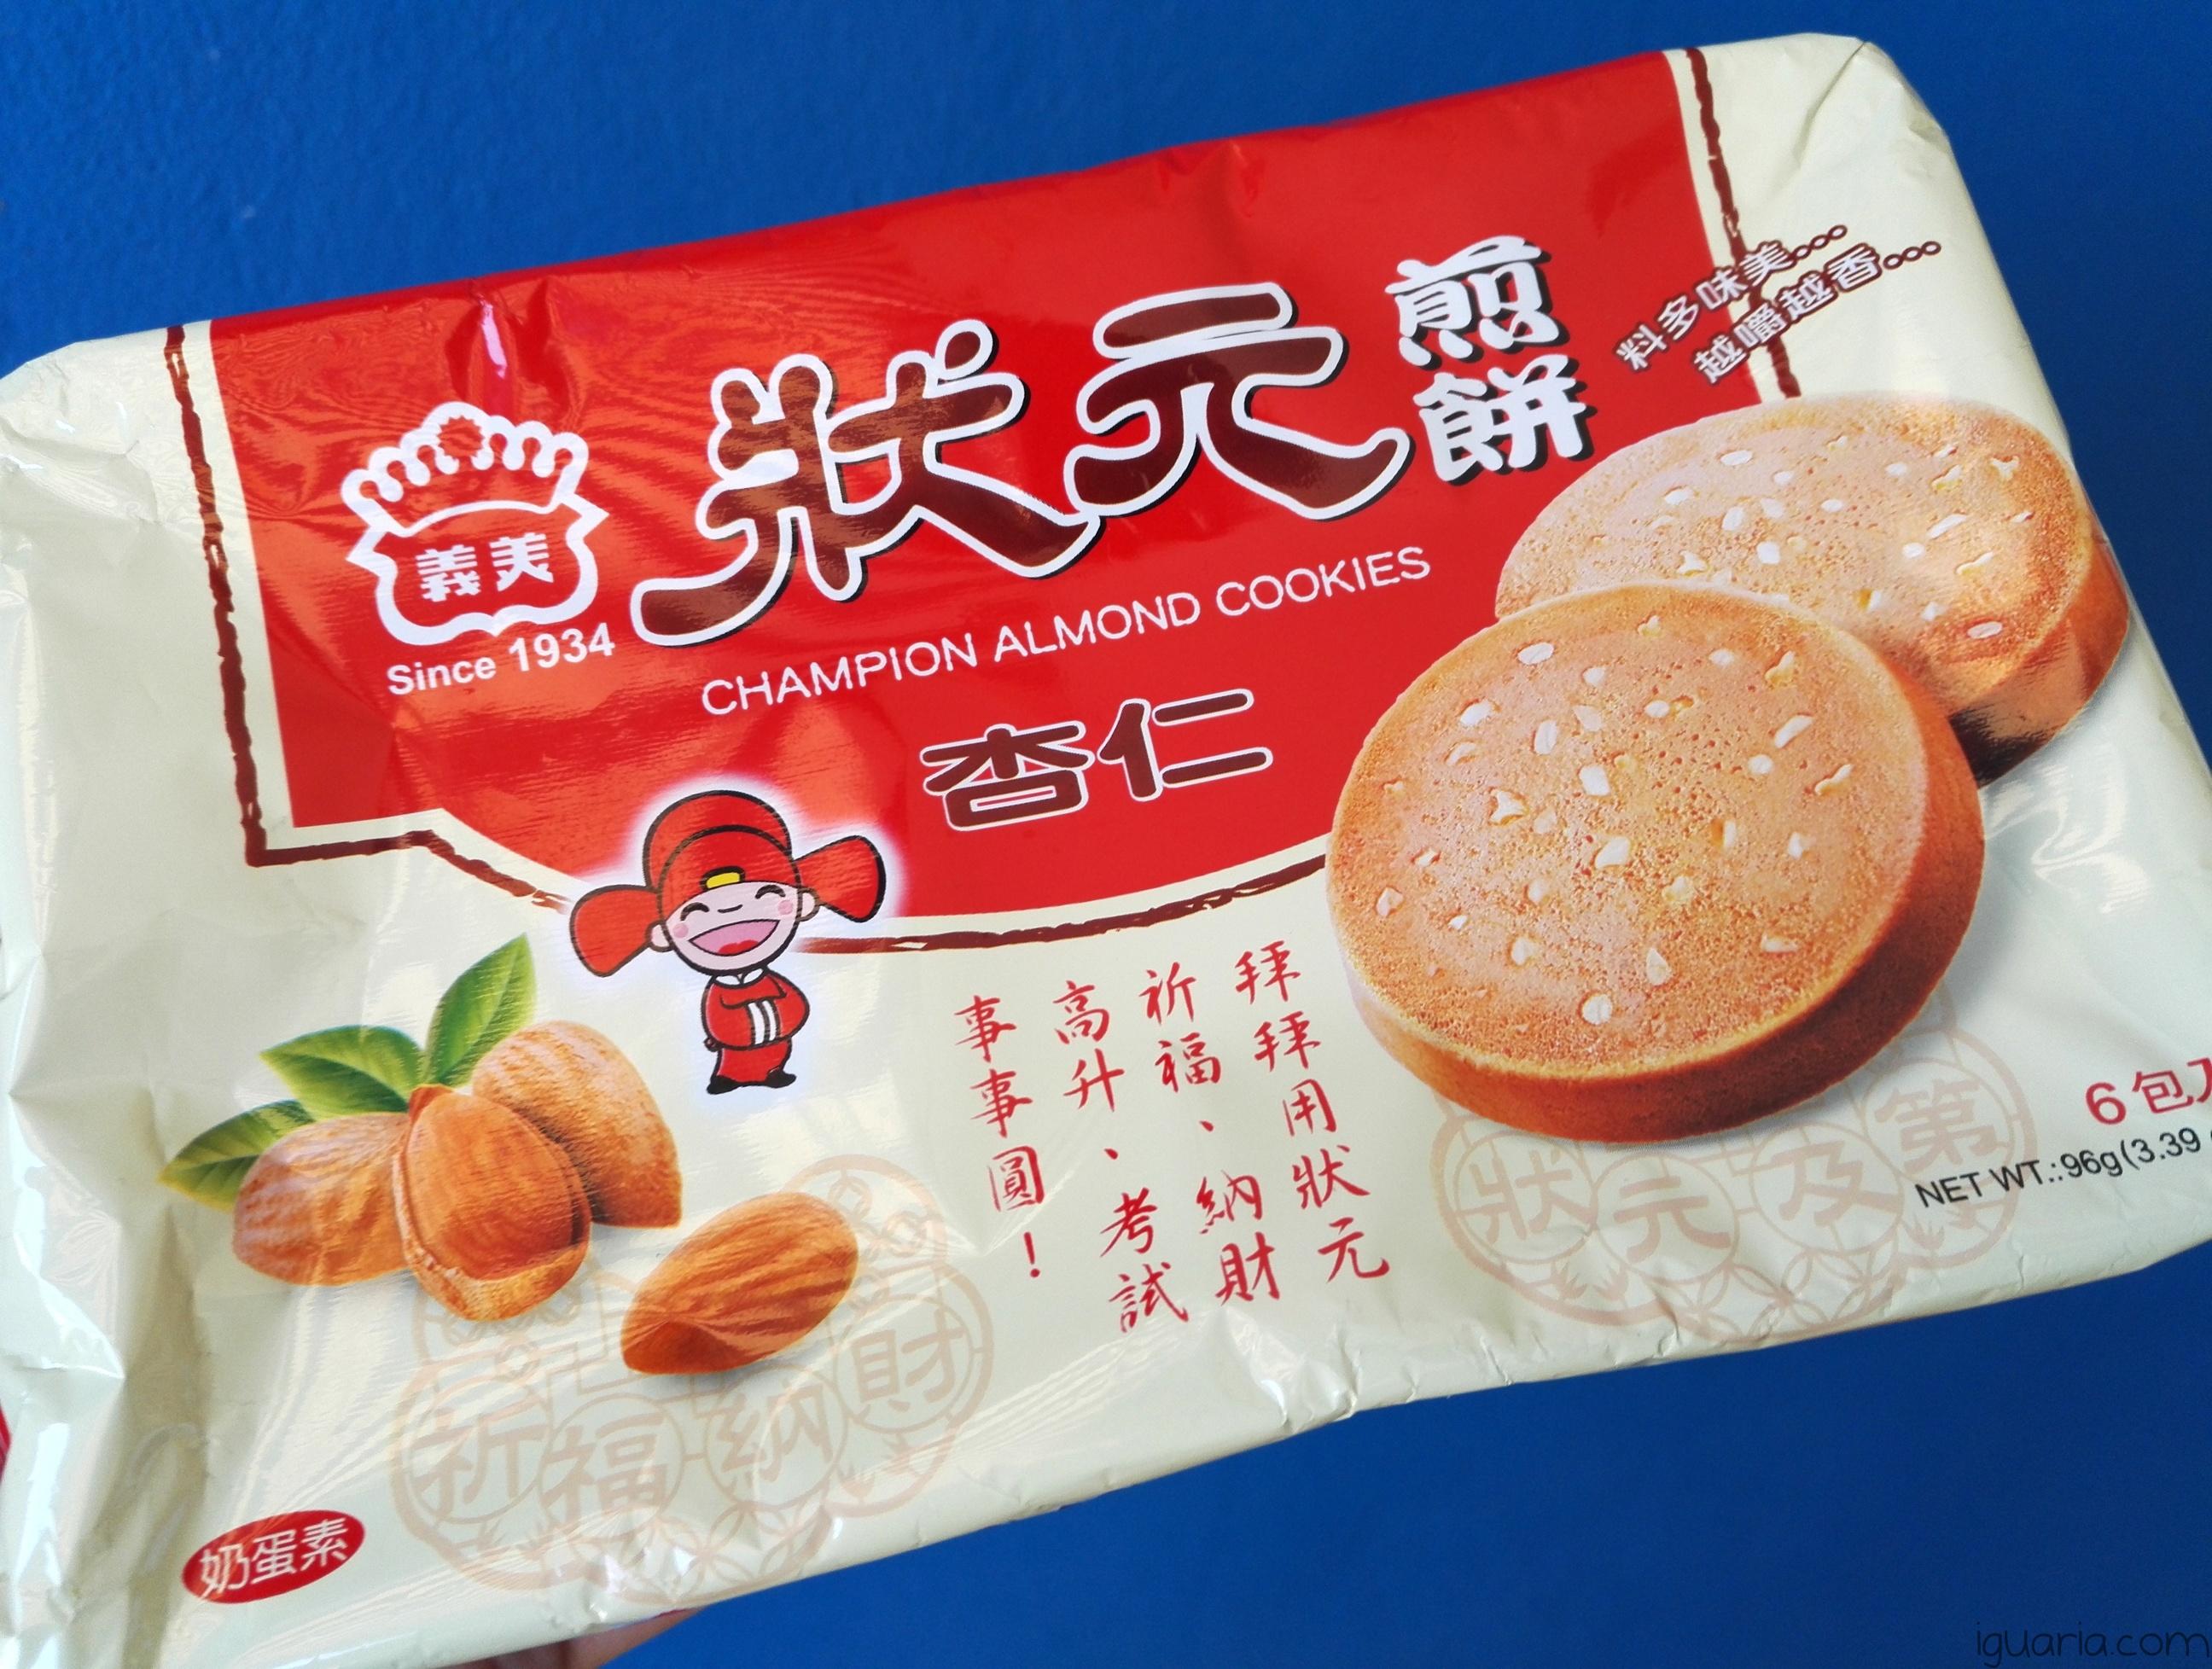 Iguaria_Biscoitos-Taiwan-Champion-Almond-Cookies